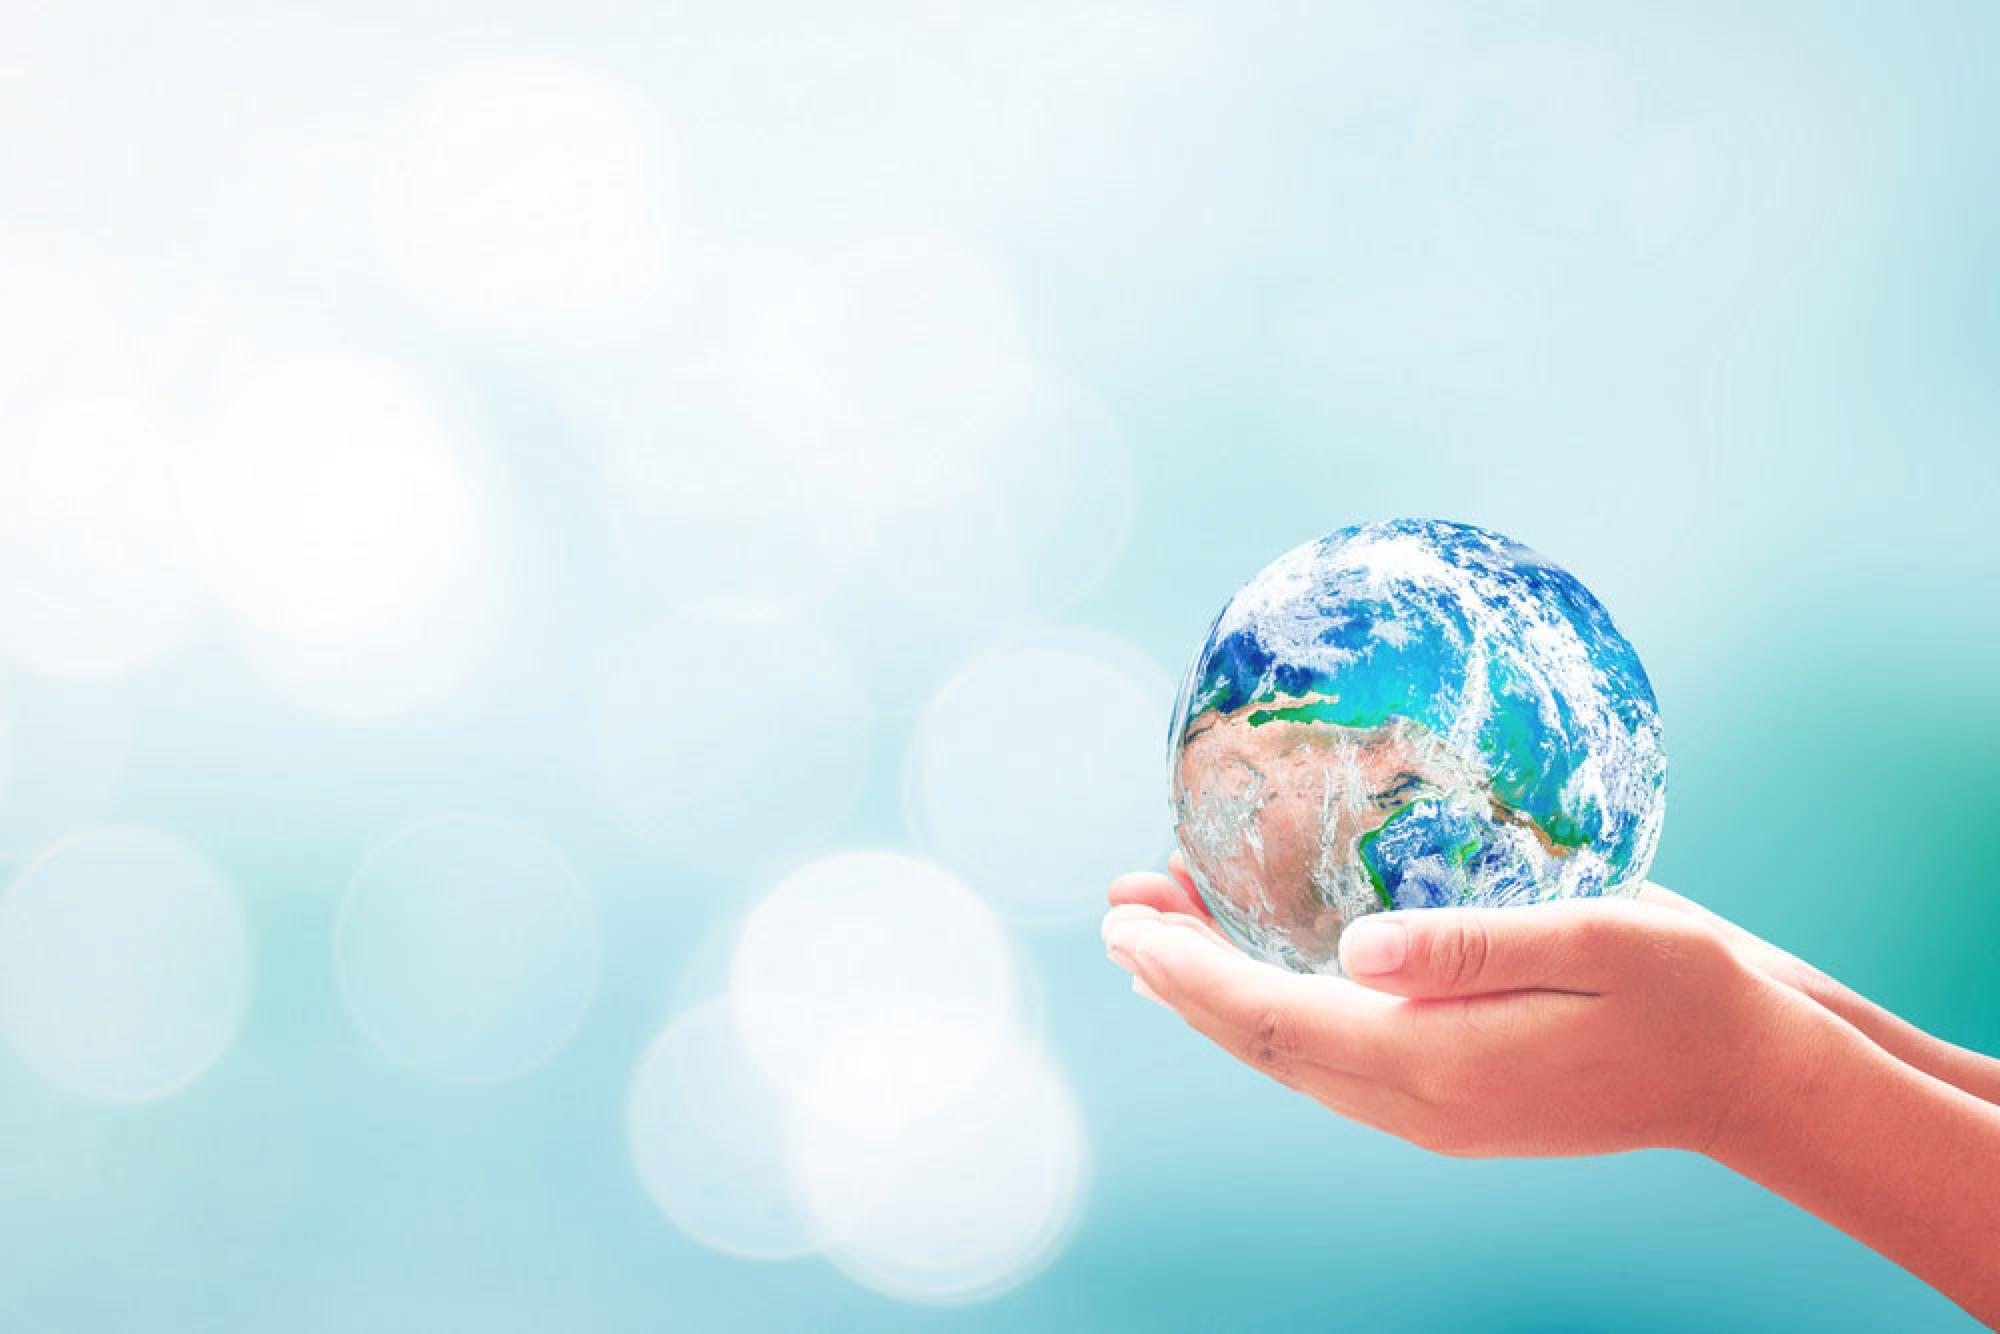 British Luxury Sustainability Manifesto The Working Groups: An update